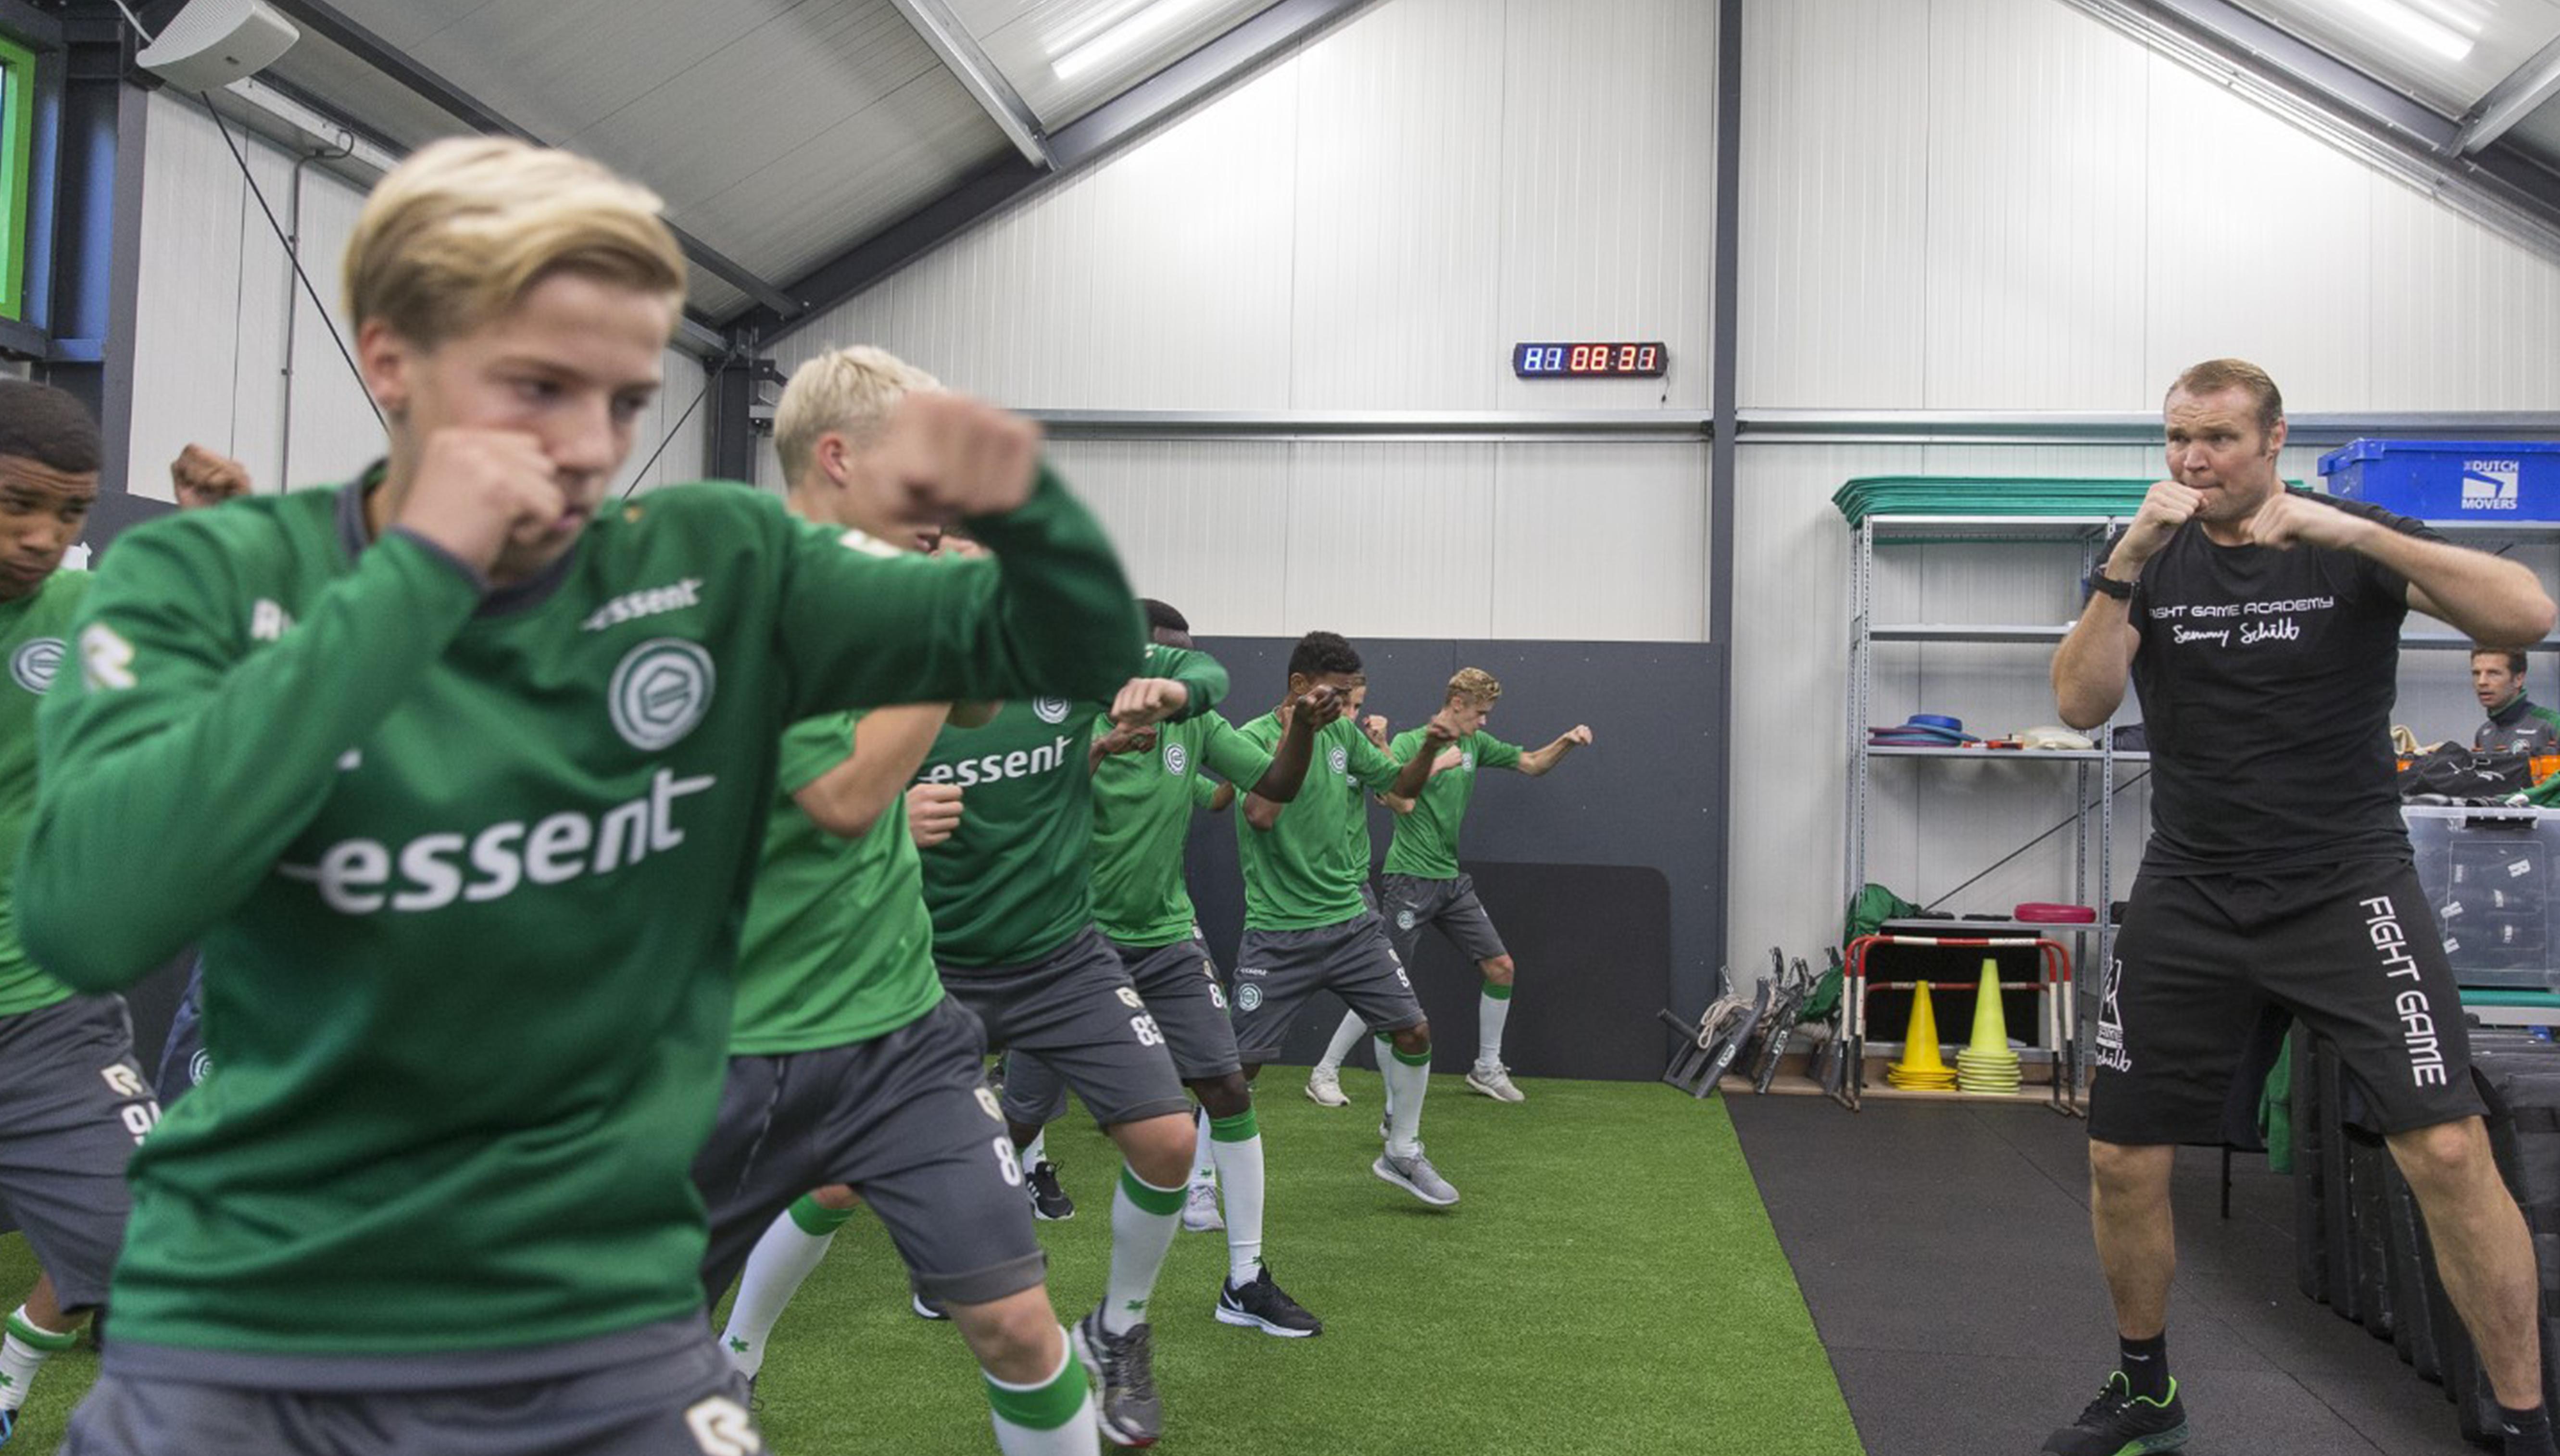 Sem Schilt verzorgt dit seizoen diverse trainingen binnen de opleiding van FC Groningen.